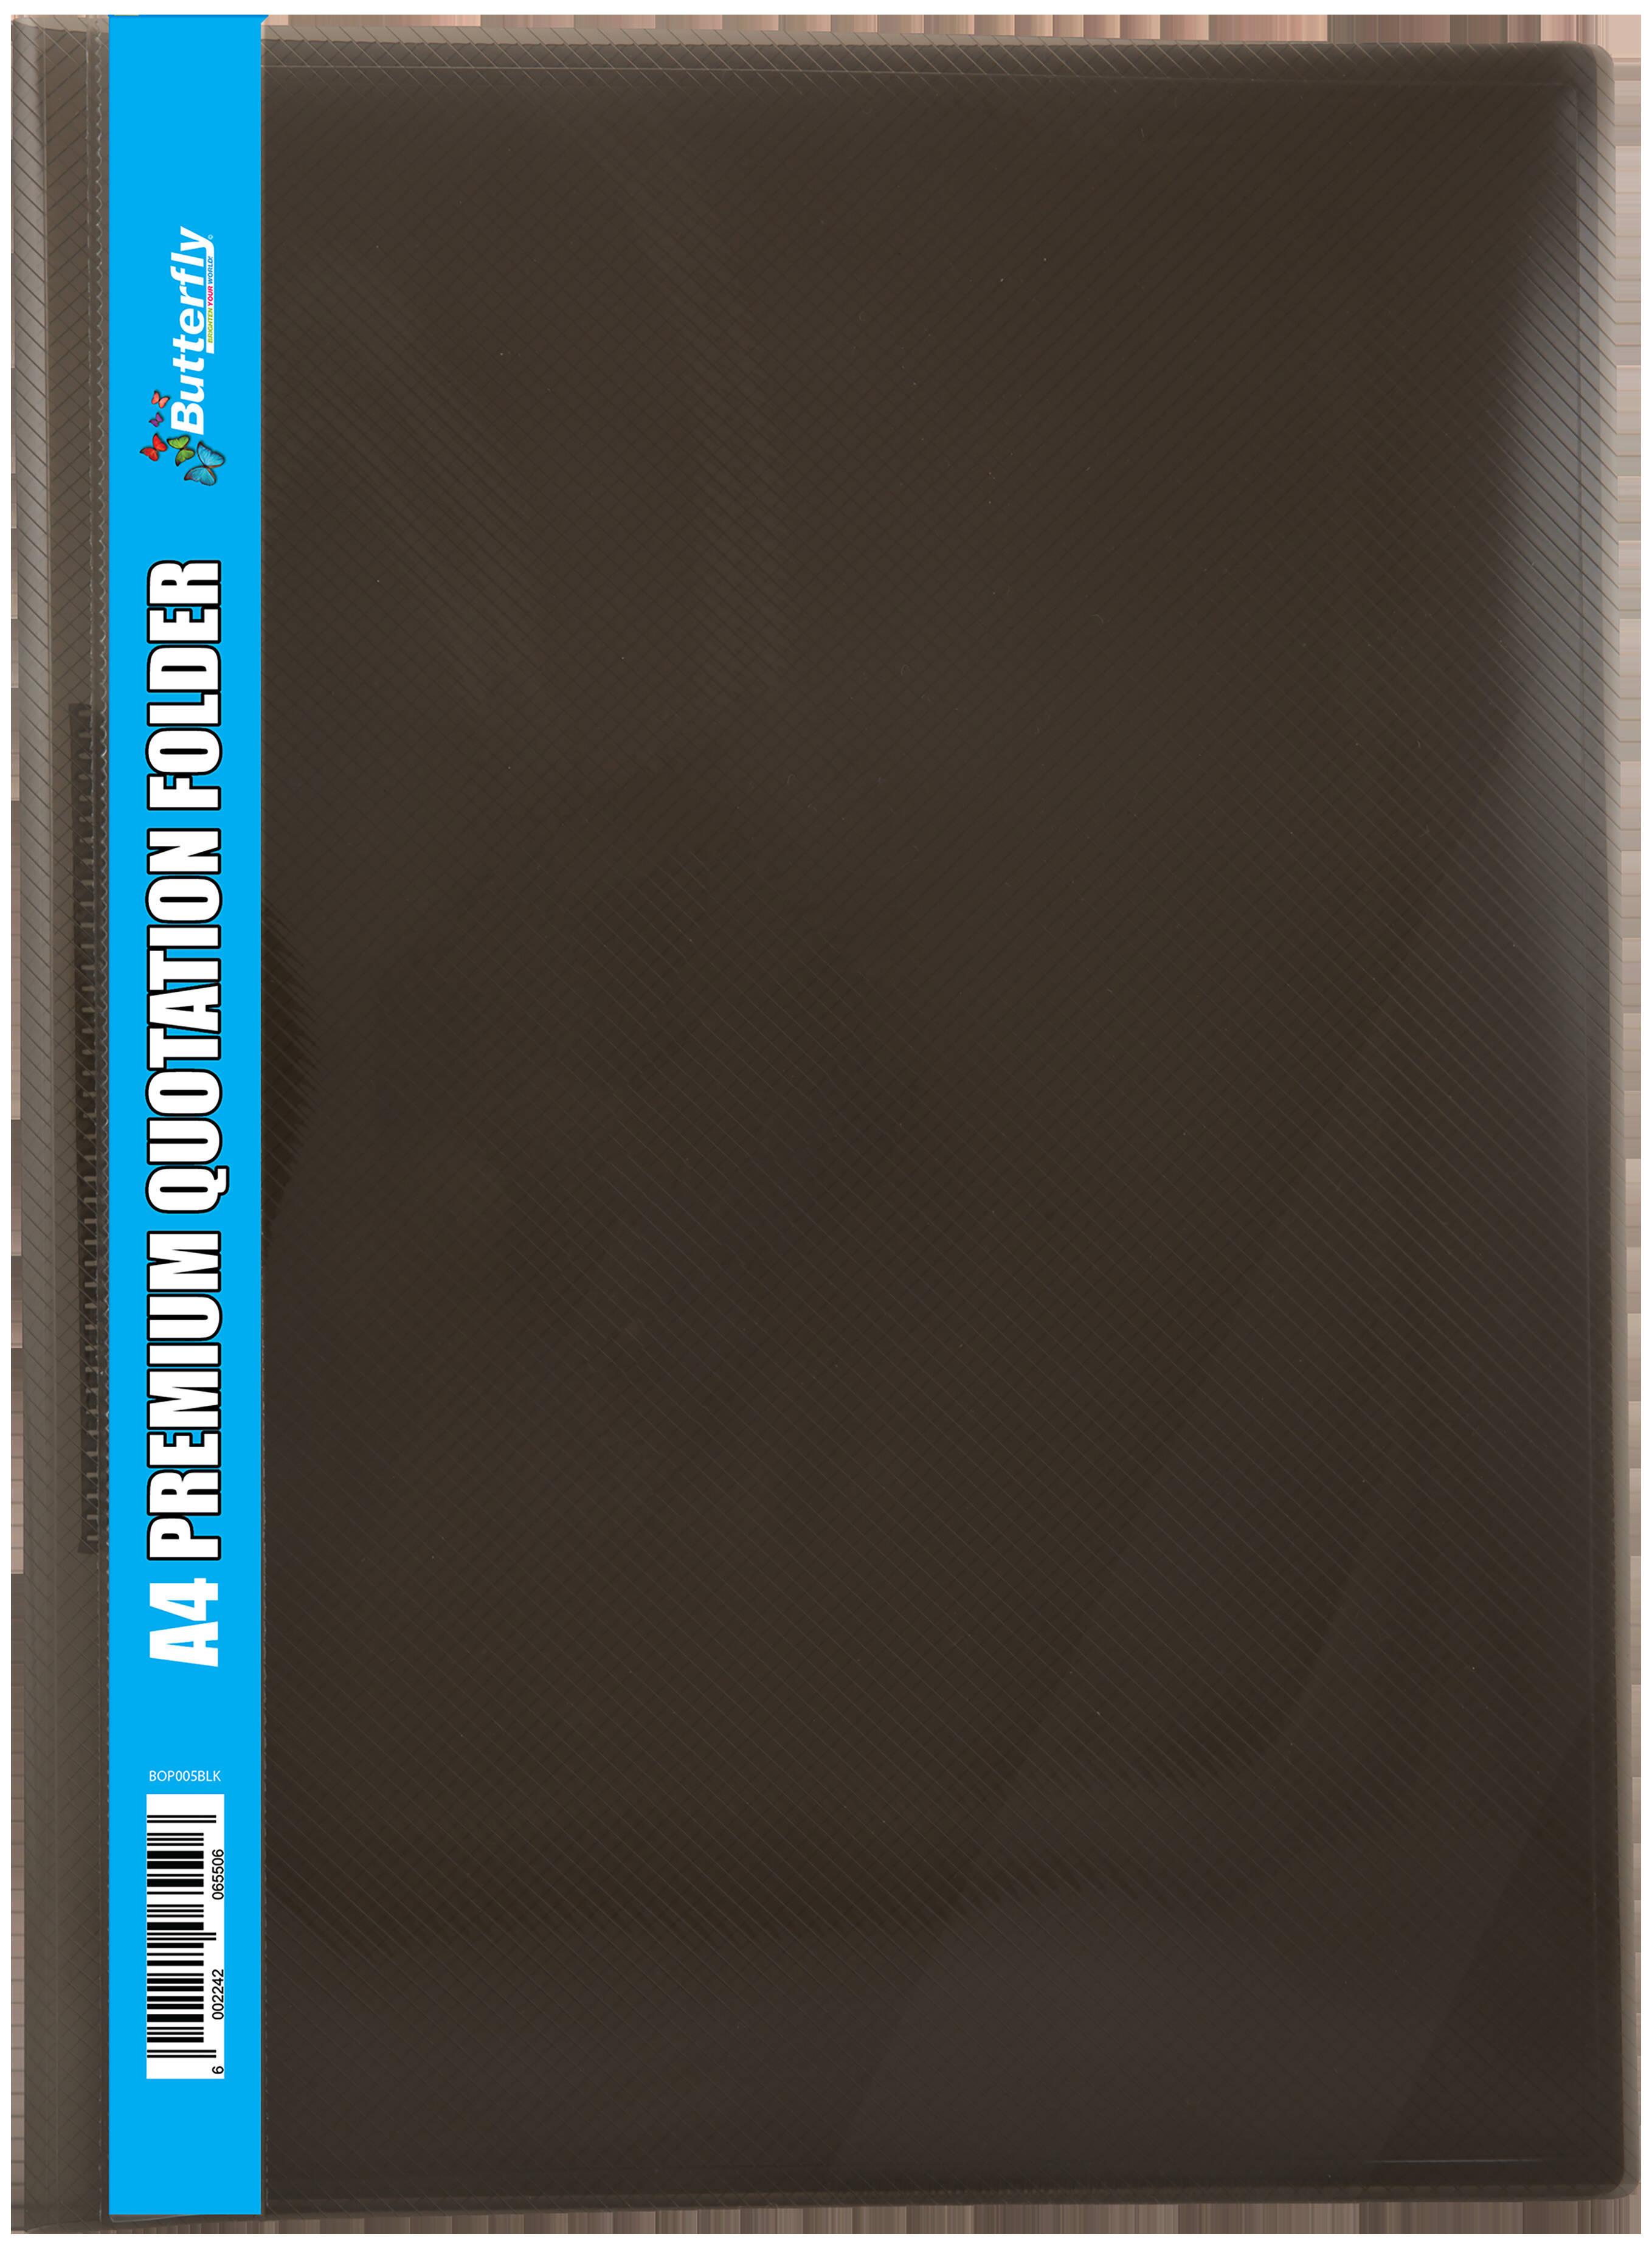 A4 Quotation Folders - 400 Micron - Black